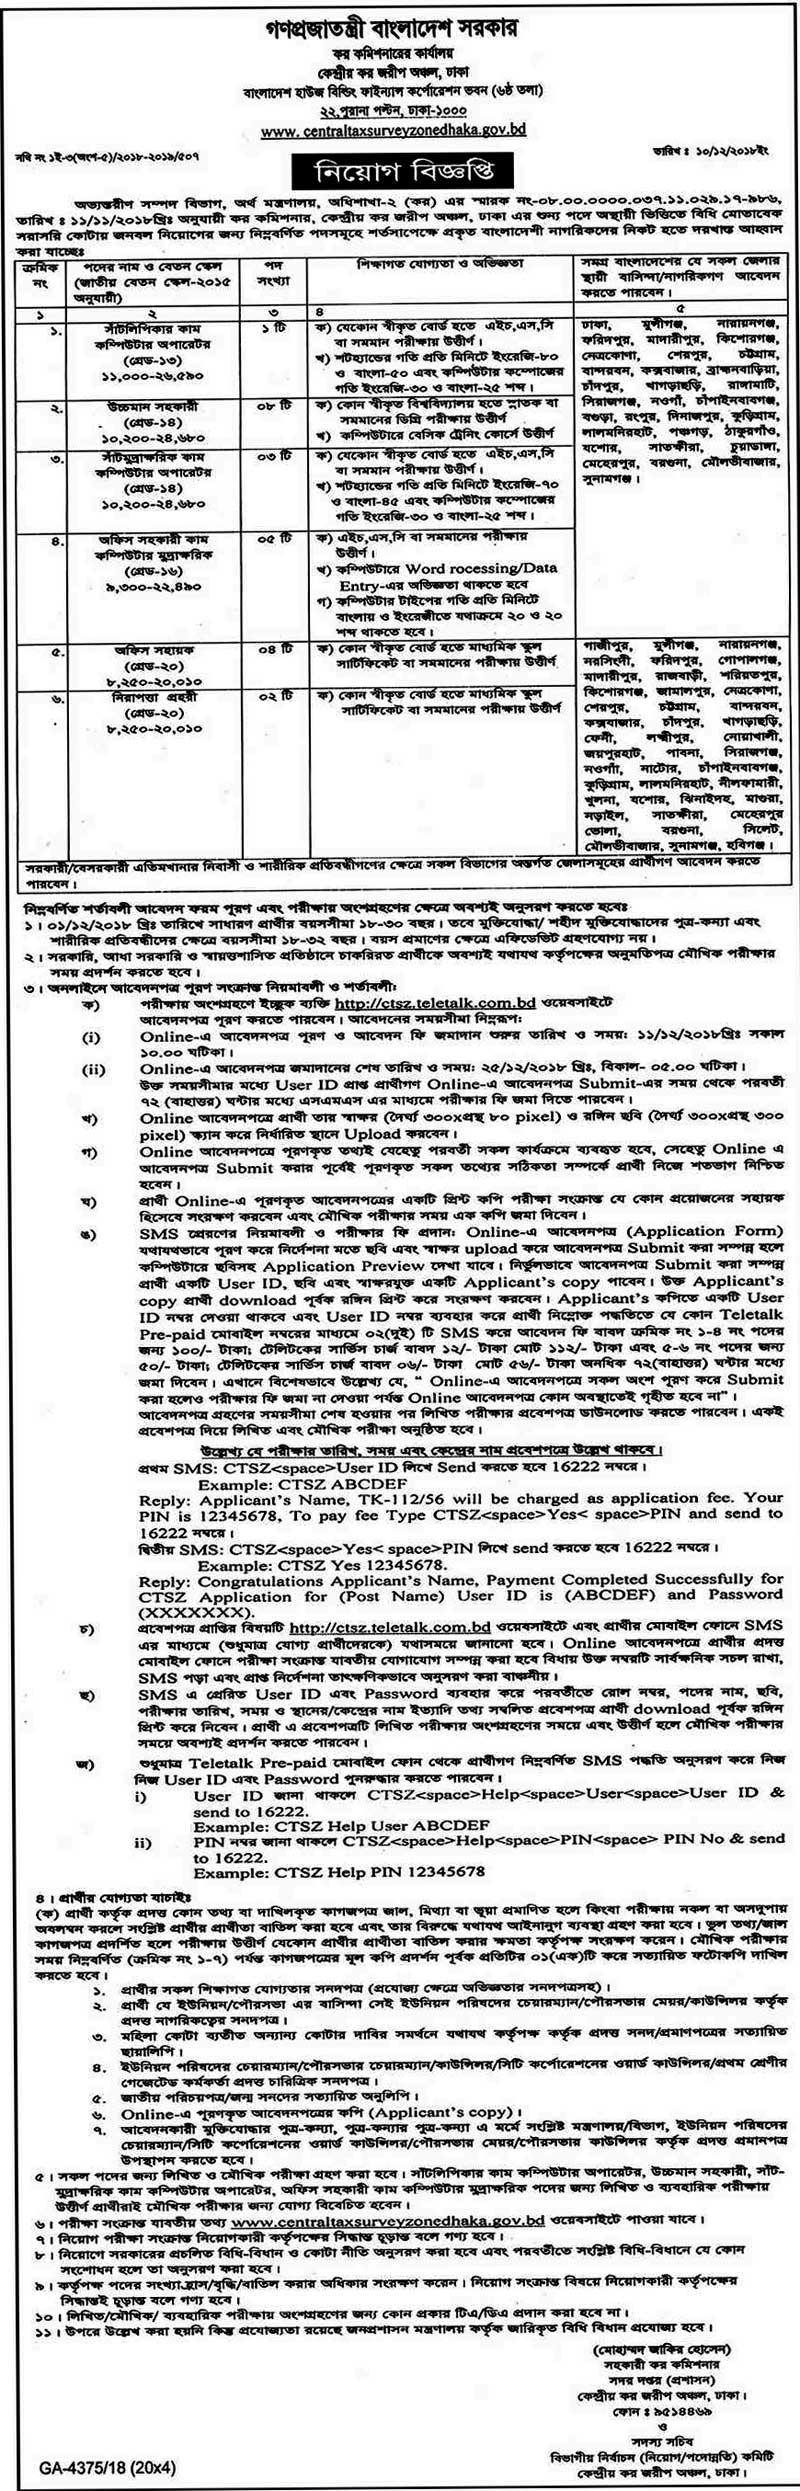 Tax Commissioner's Office Job Circular 2018